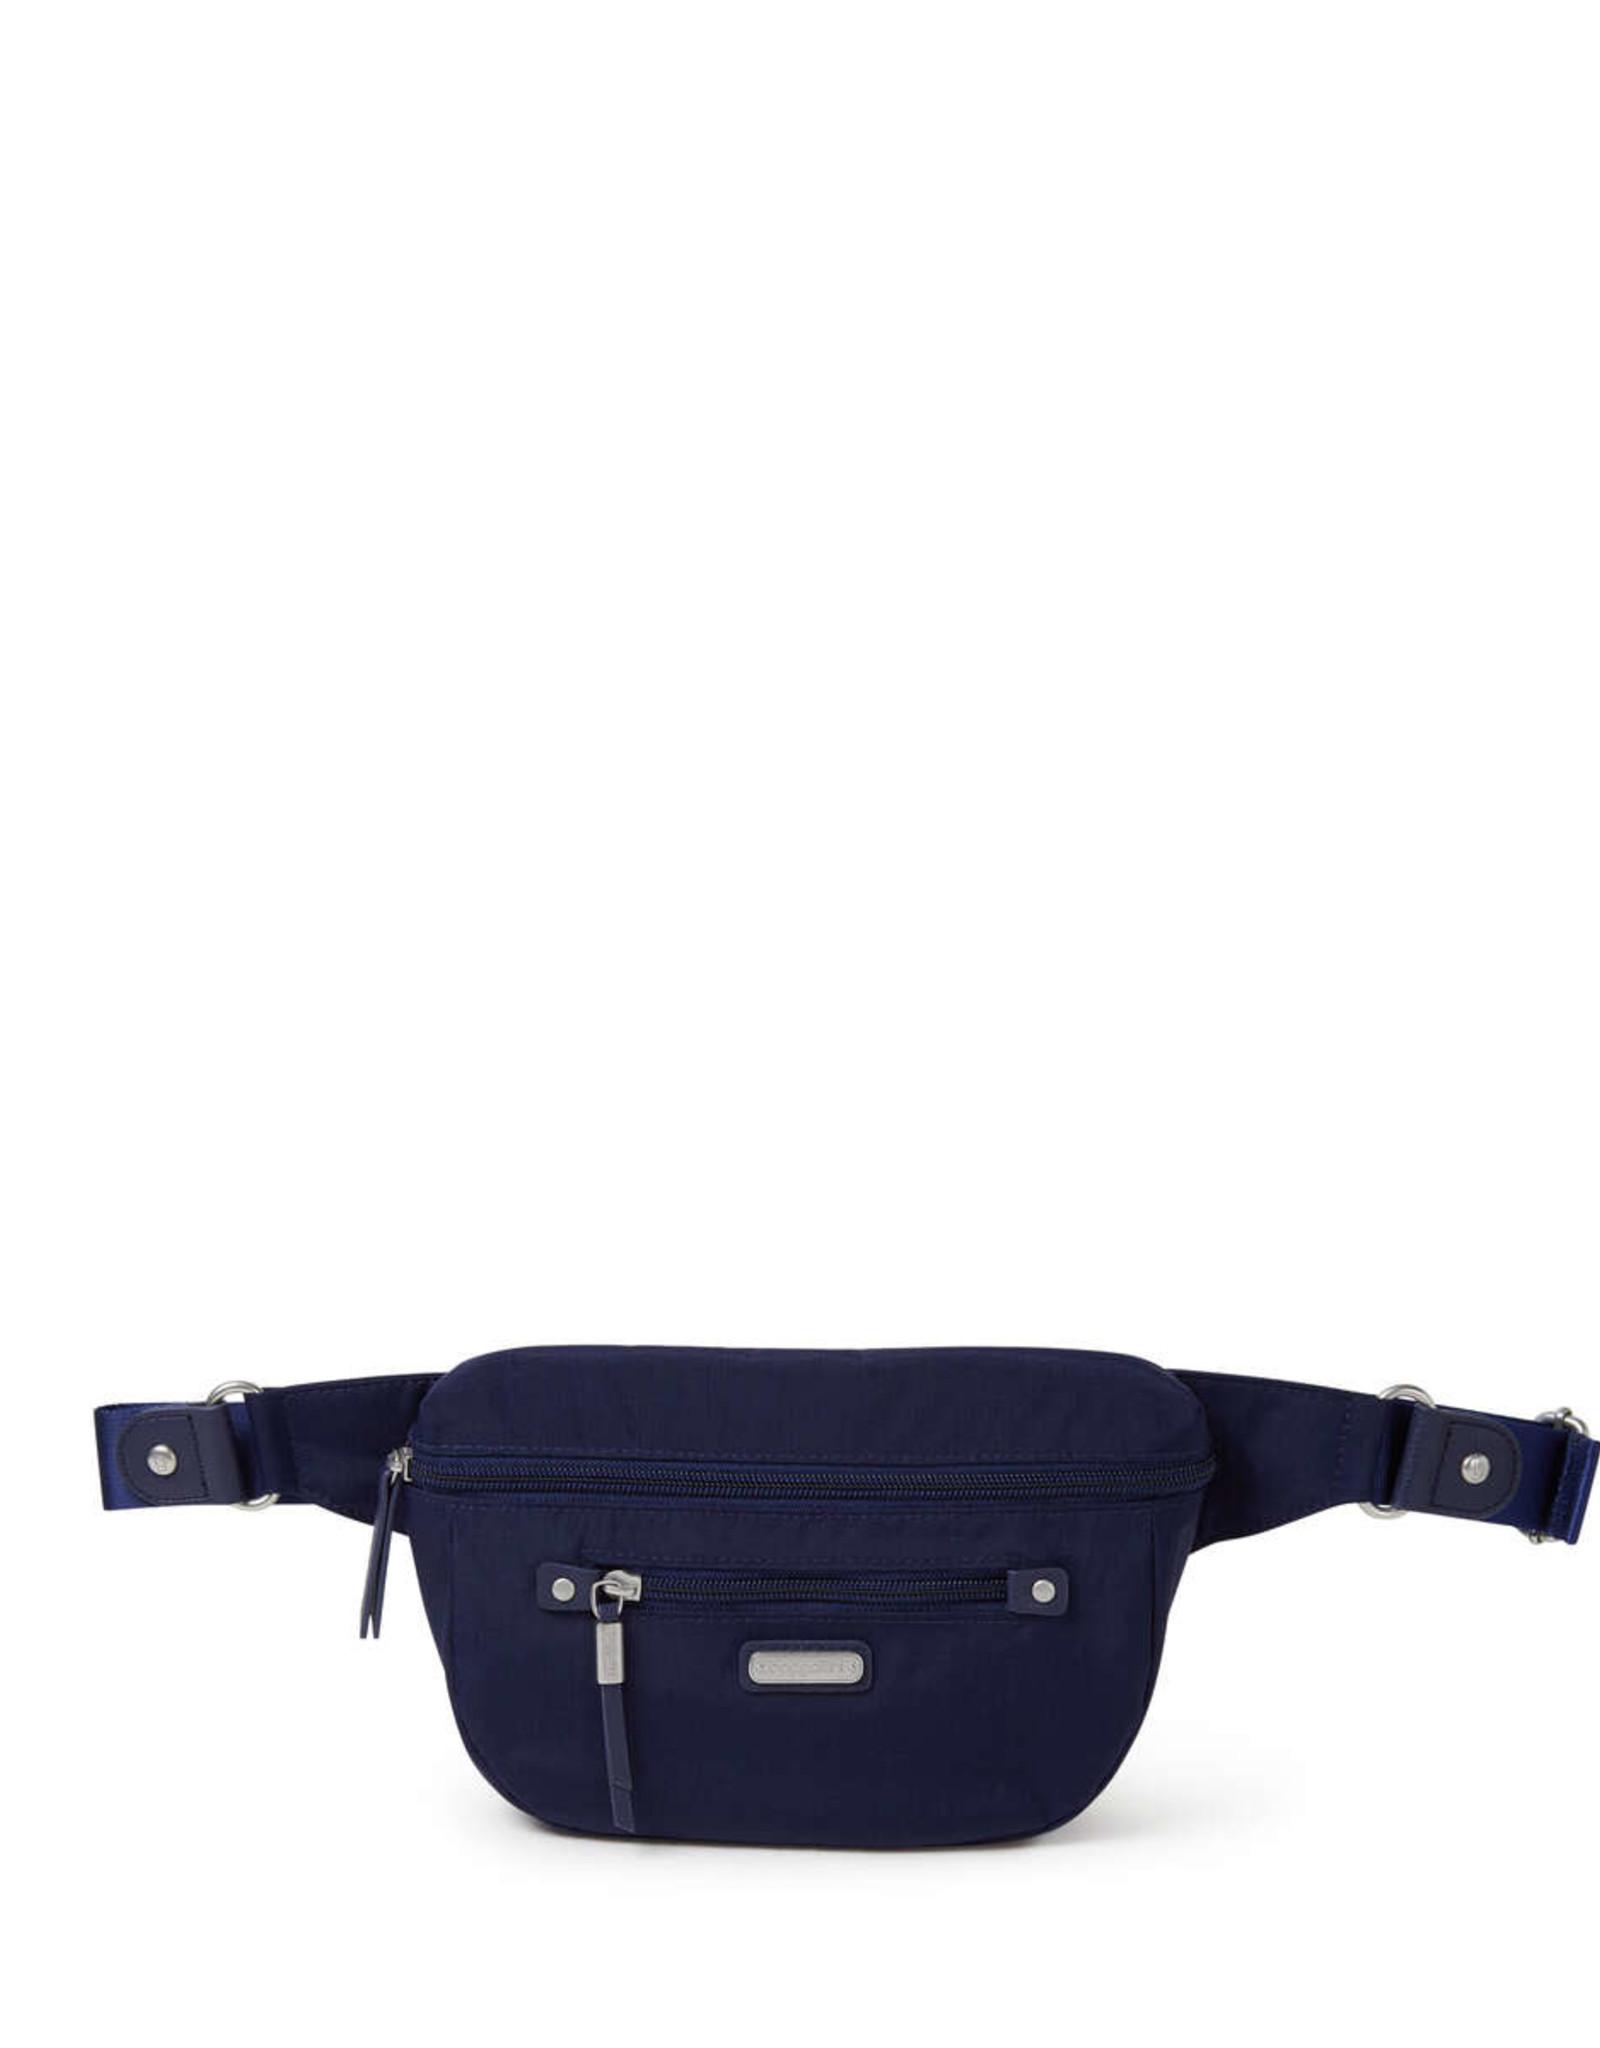 Baggallini Sightseer Waistpack Bag